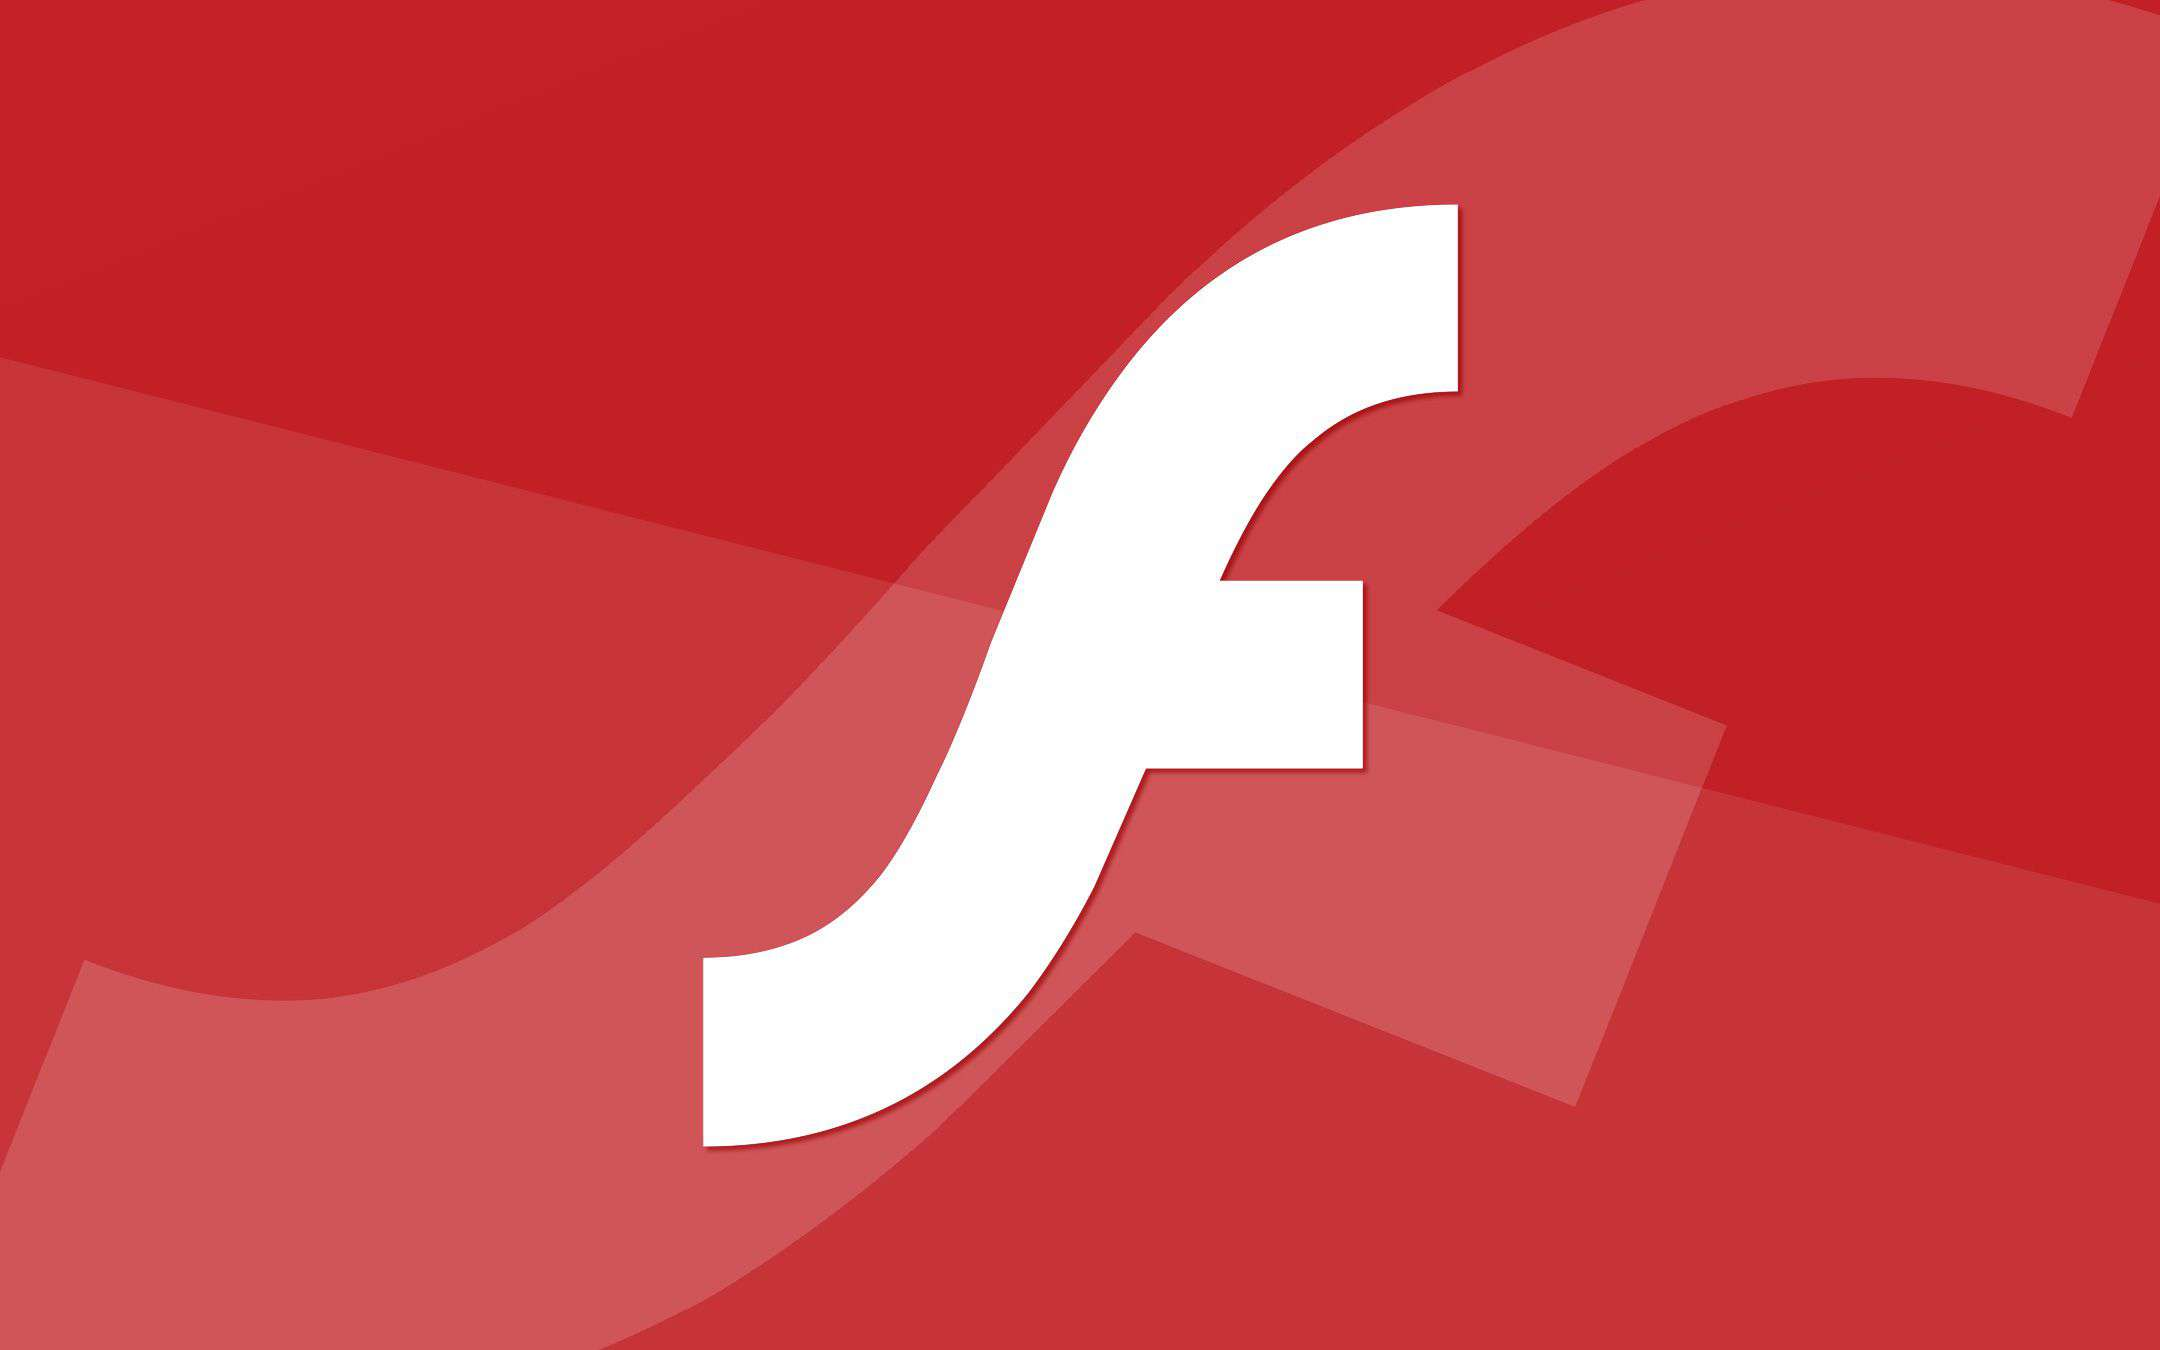 Windows 10 automatically deletes Flash Player